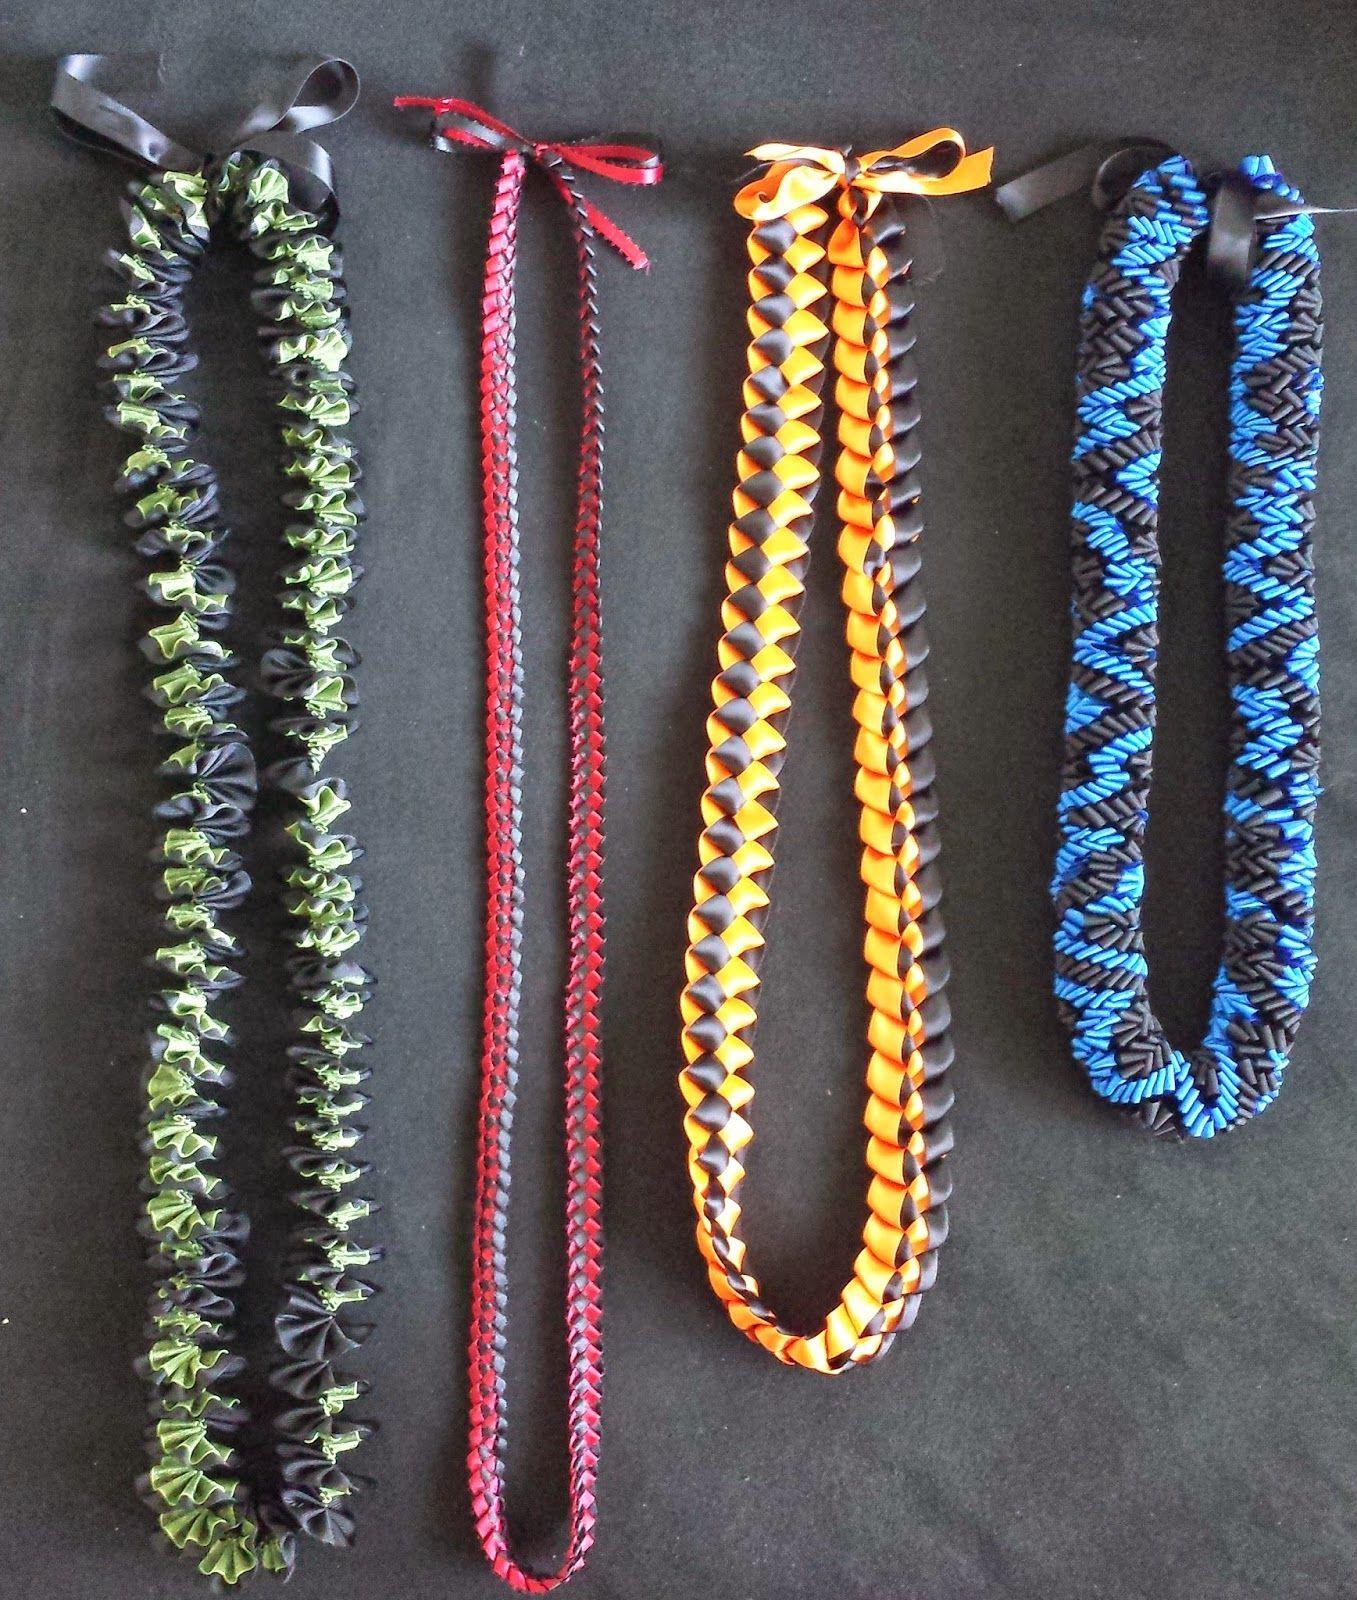 Best ideas about Graduation Leis DIY . Save or Pin DIY Grad Ribbon Leis DIY & Crafts Now.